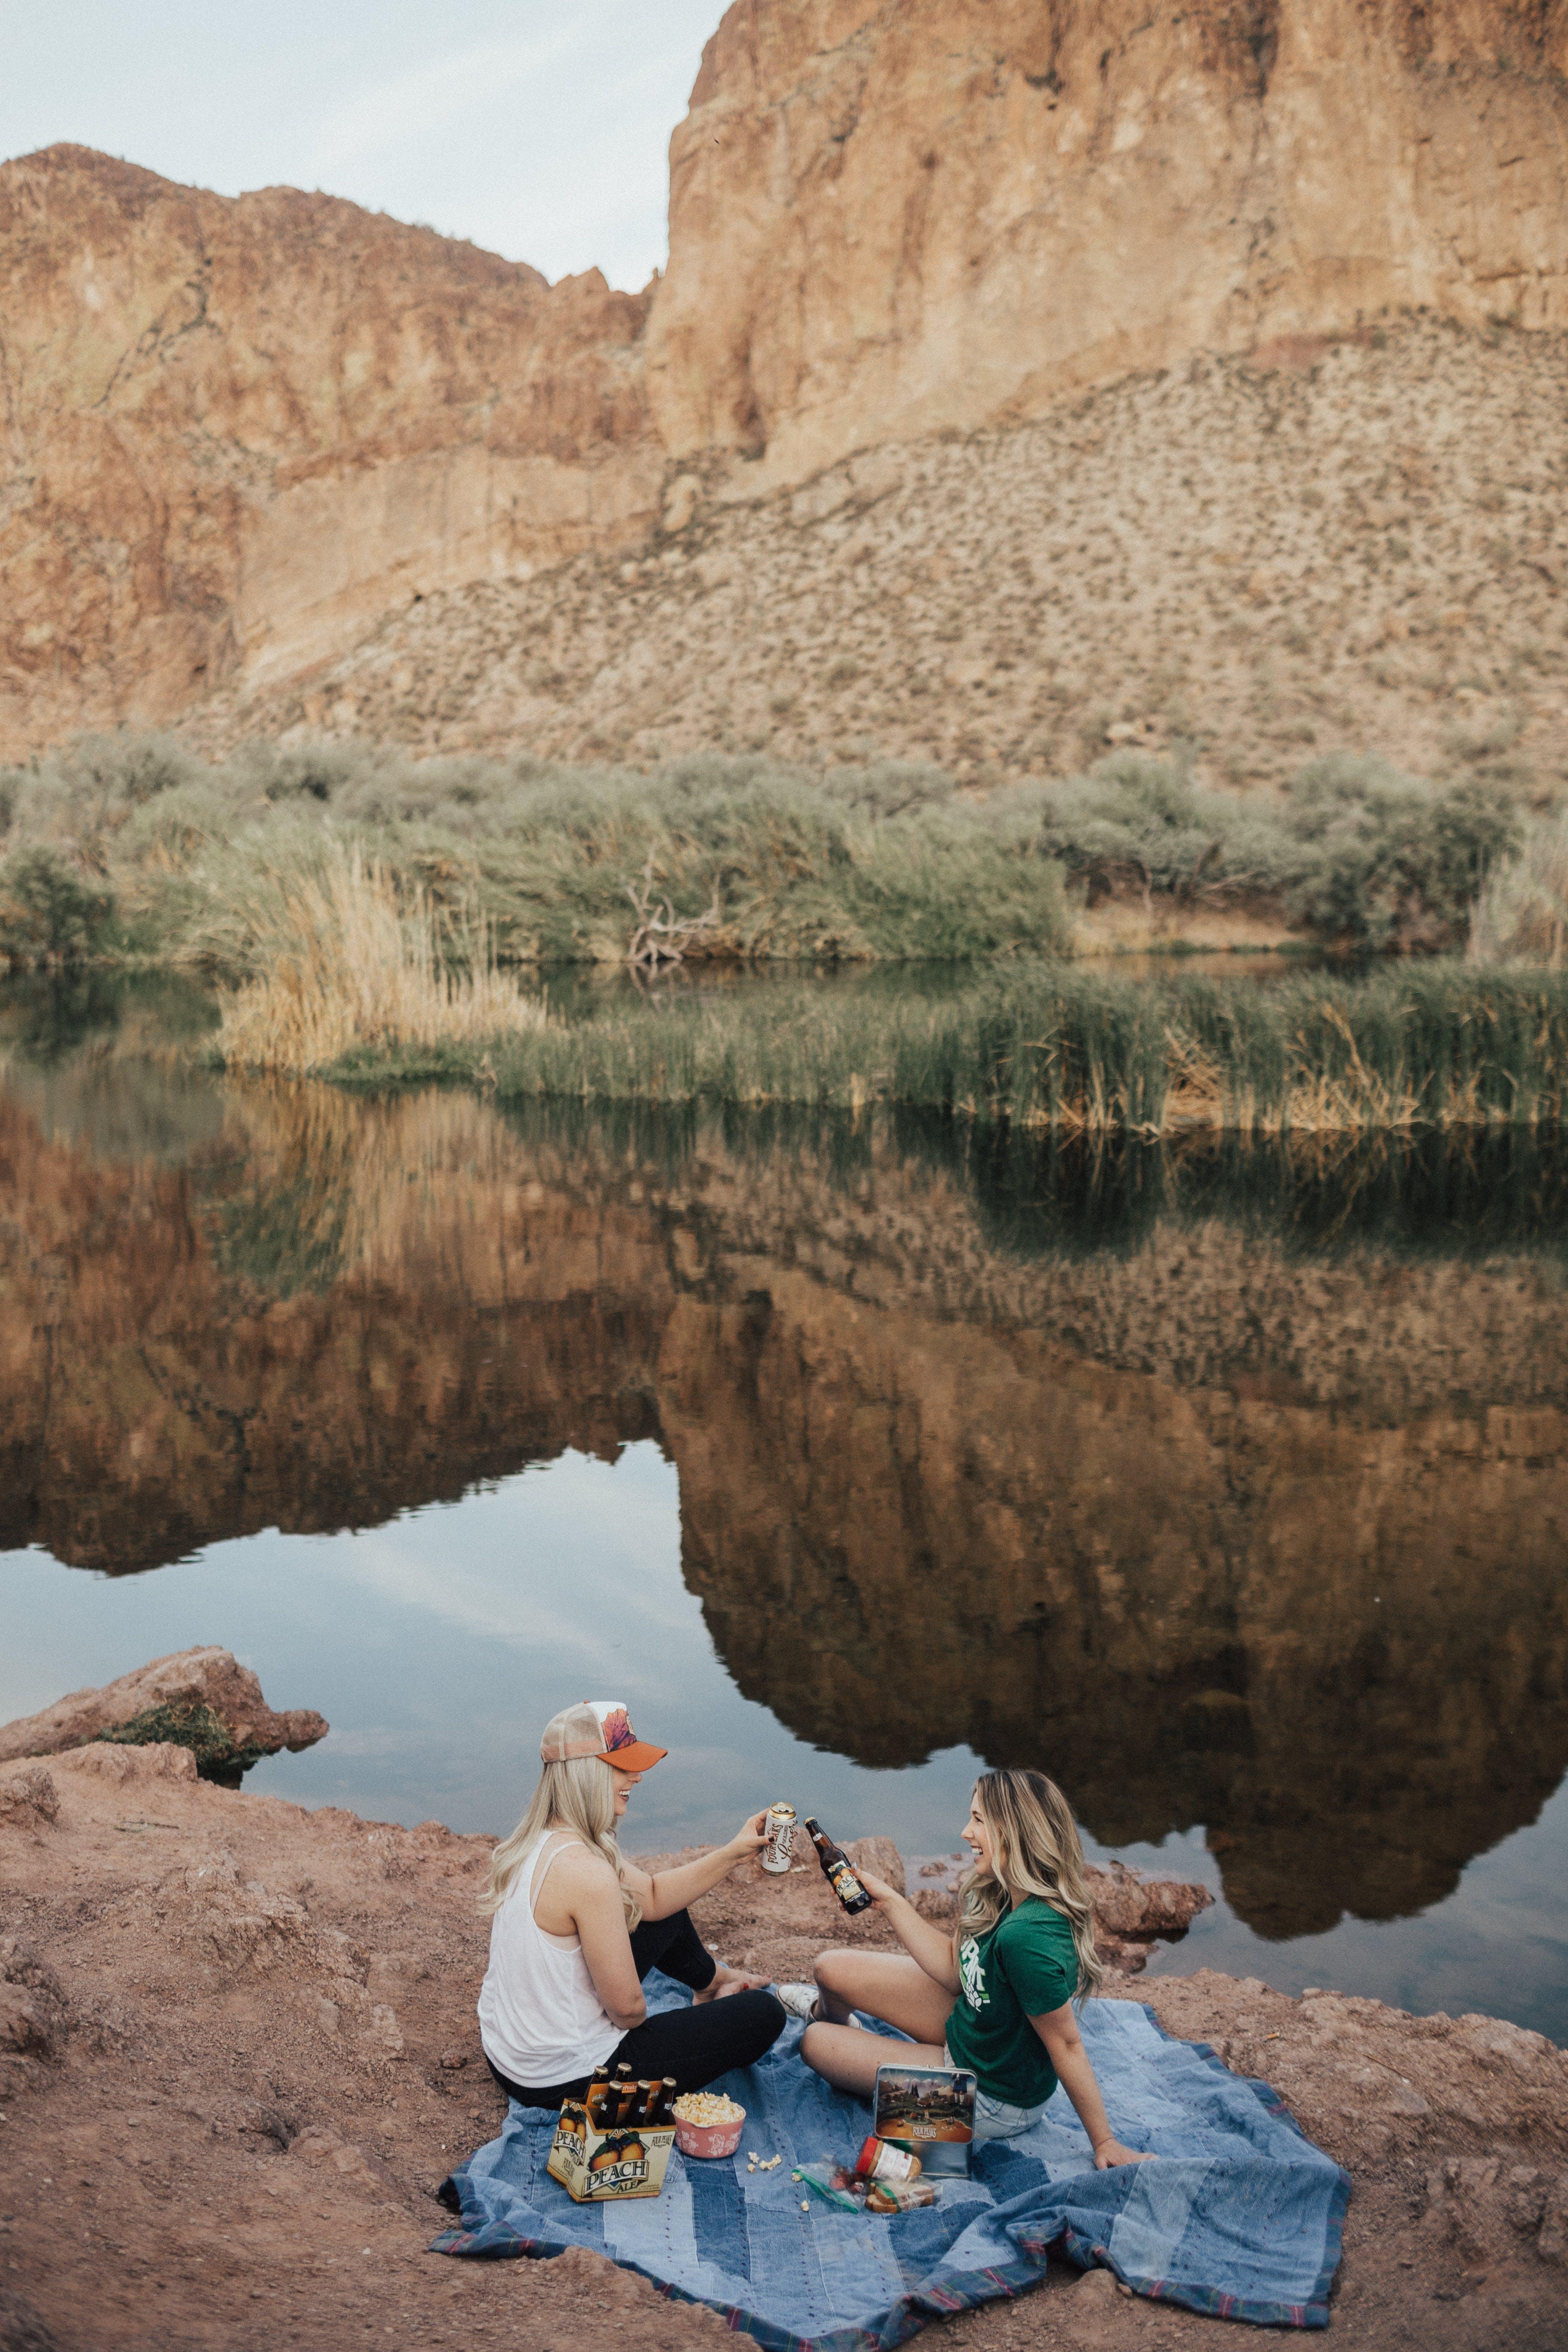 Two Woman Sitting Near Body of Water